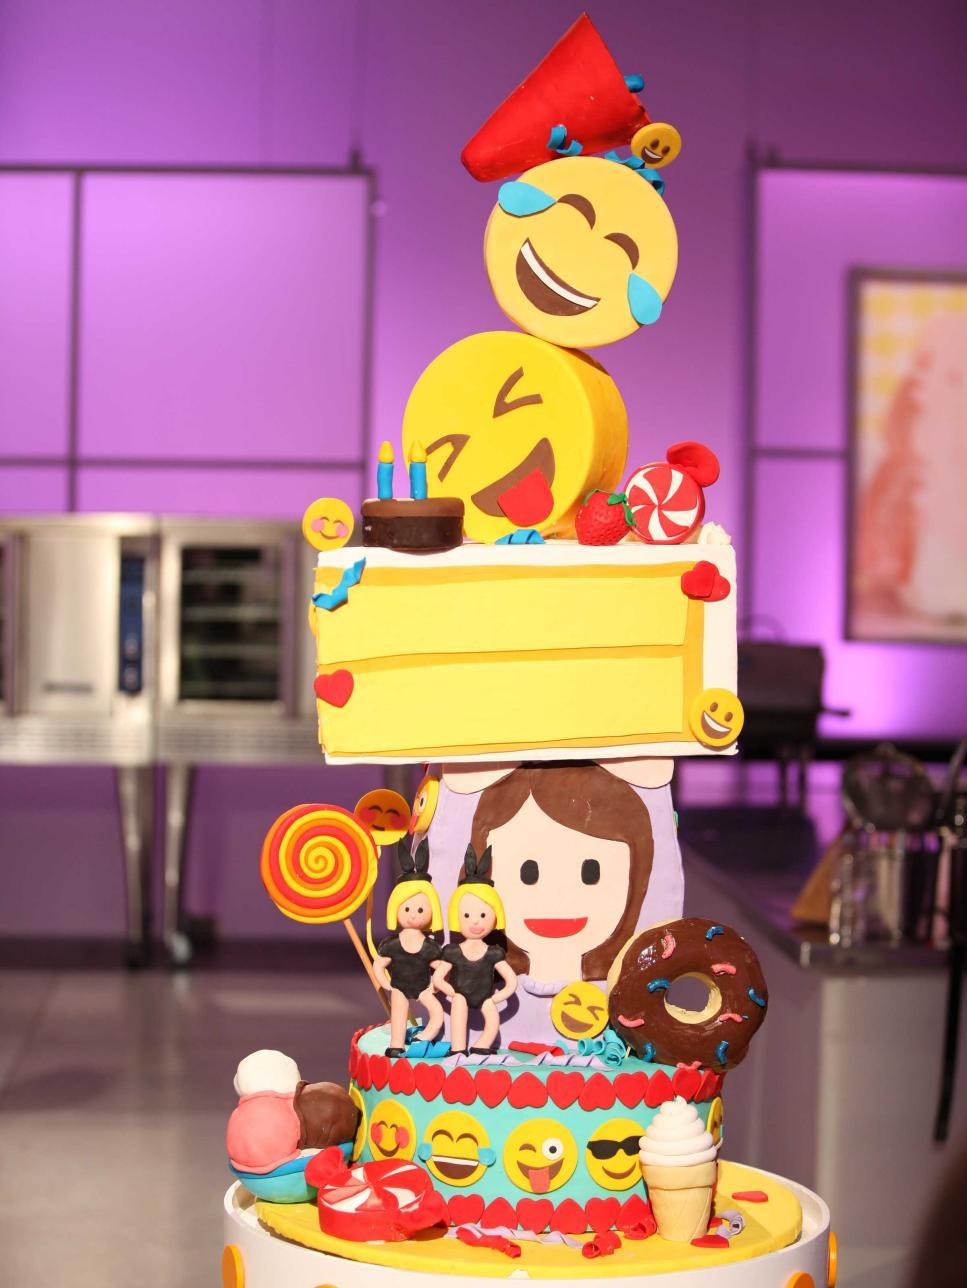 The Winning Creations From Cake Wars Season 3 Cake Wars